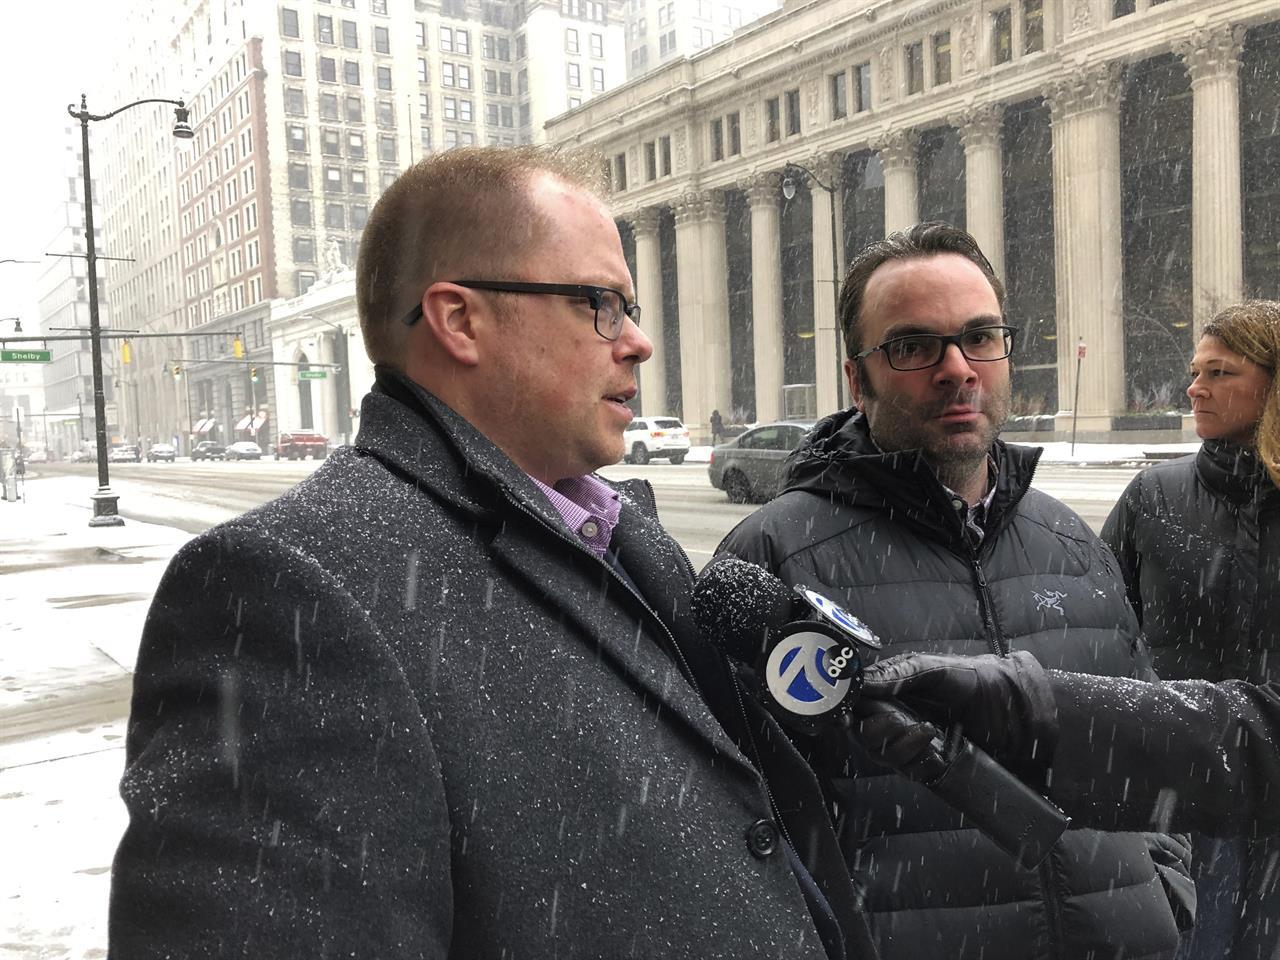 Michigan adoption fraudster sentenced to 10 years in prison